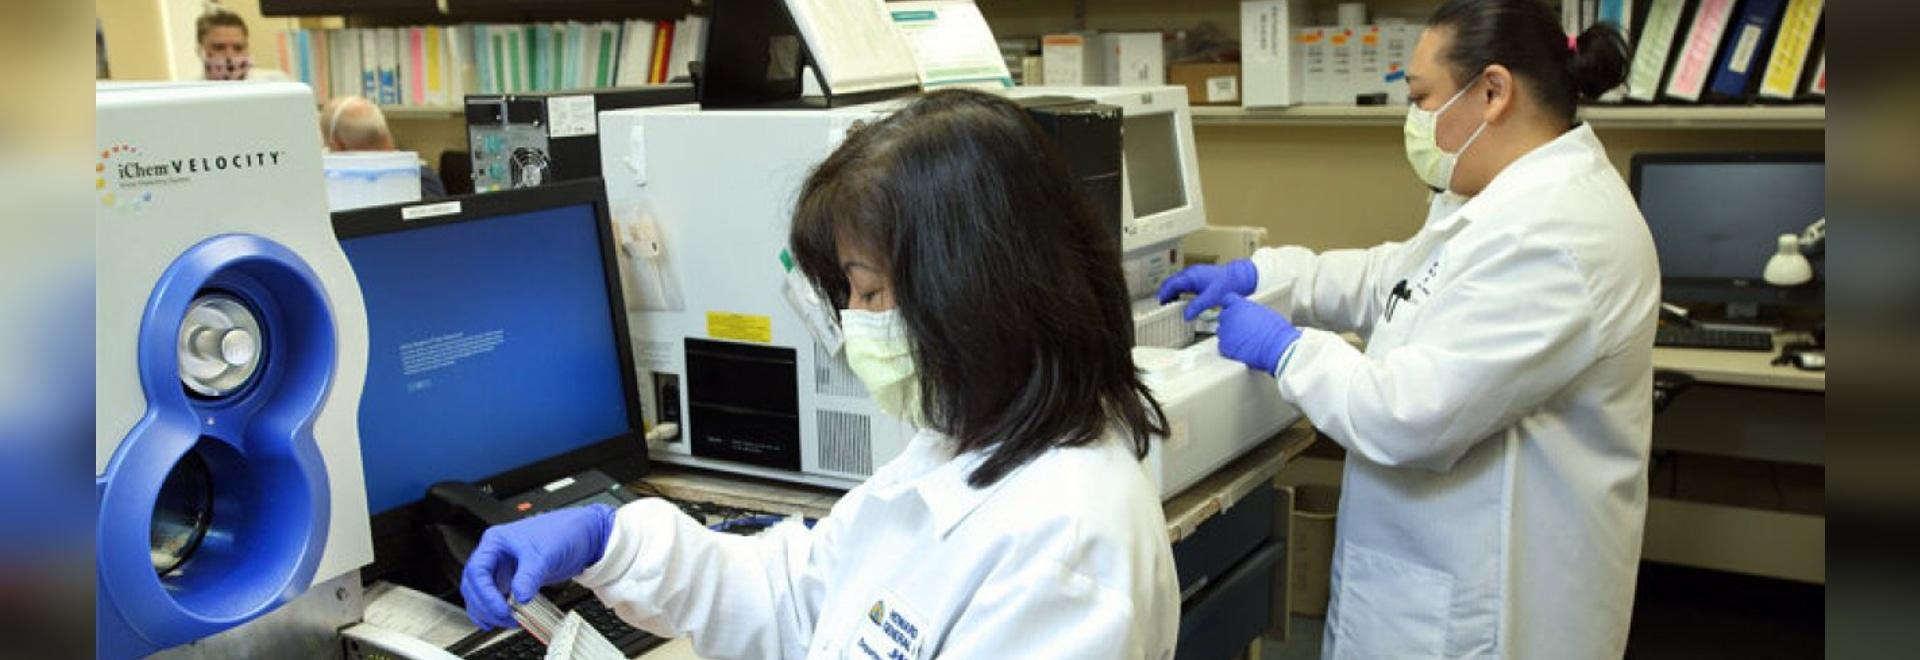 Beware of False Negatives in COVID-19 Diagnostic Testing